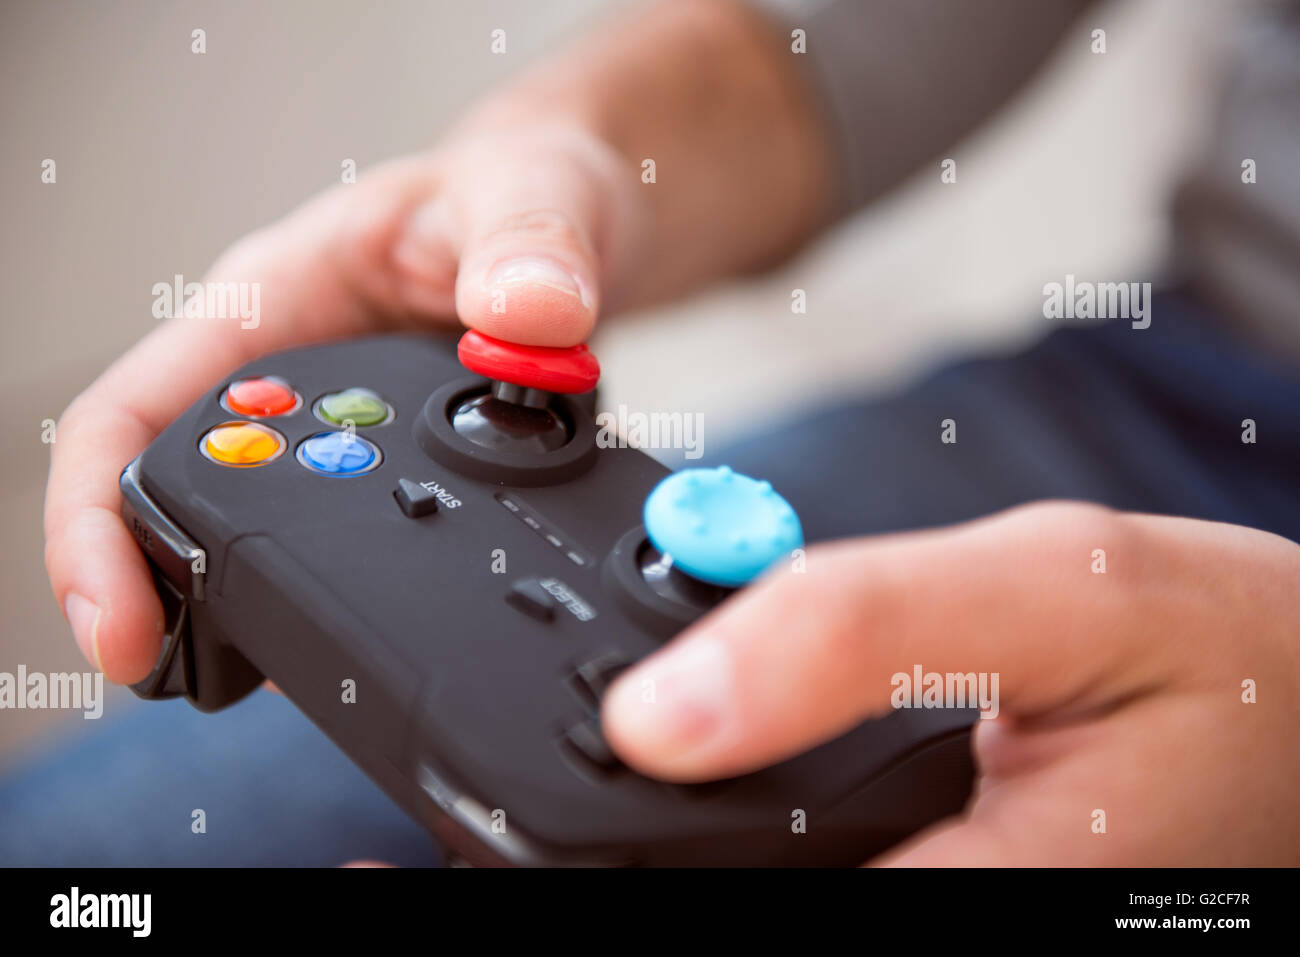 Man playing and holding joystick - Stock Image